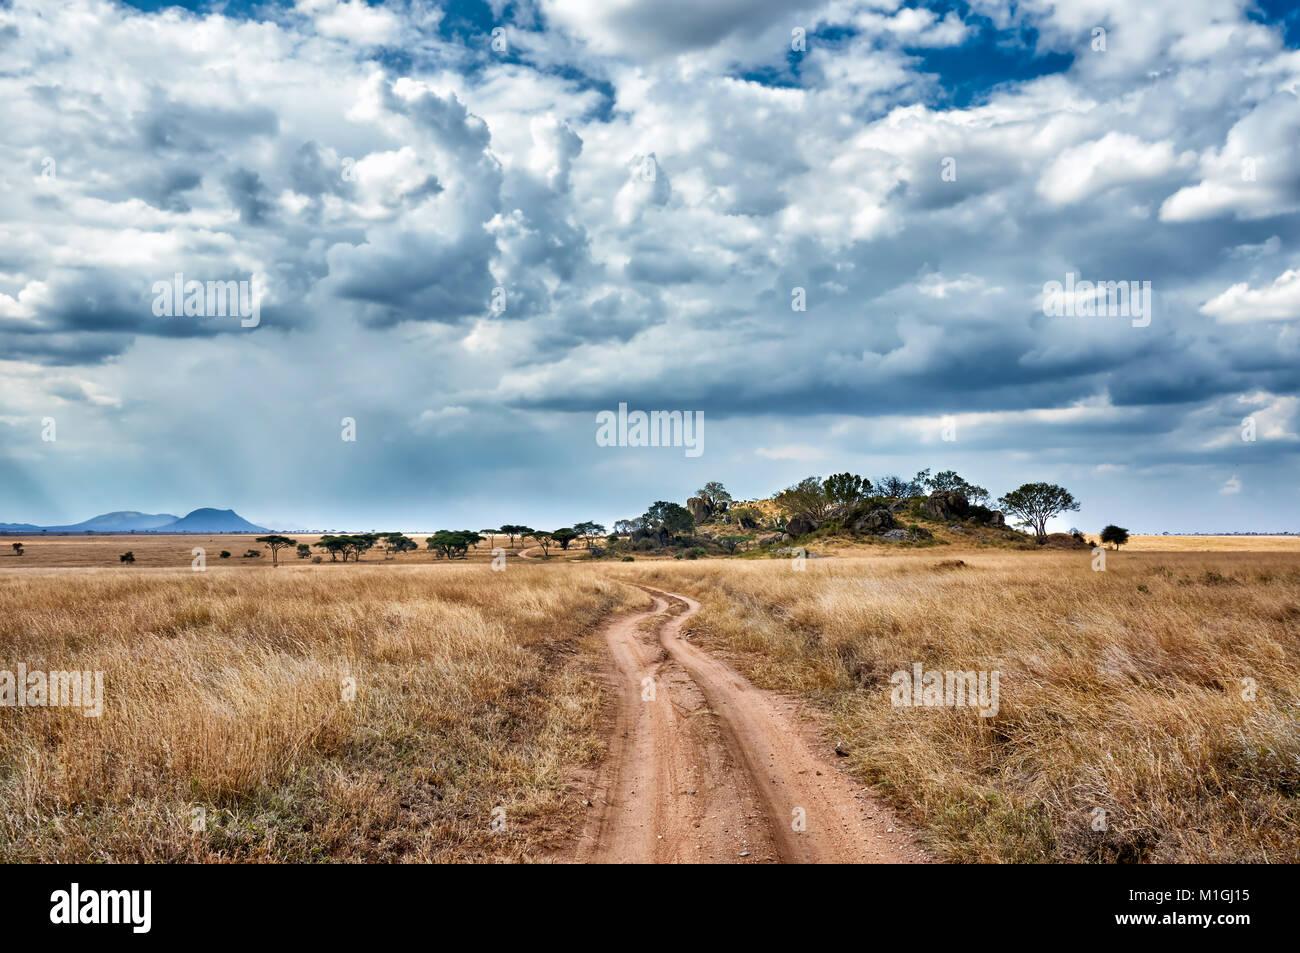 gravel road through landscape in Serengeti National Park, UNESCO world heritage site, Tanzania, Africa - Stock Image